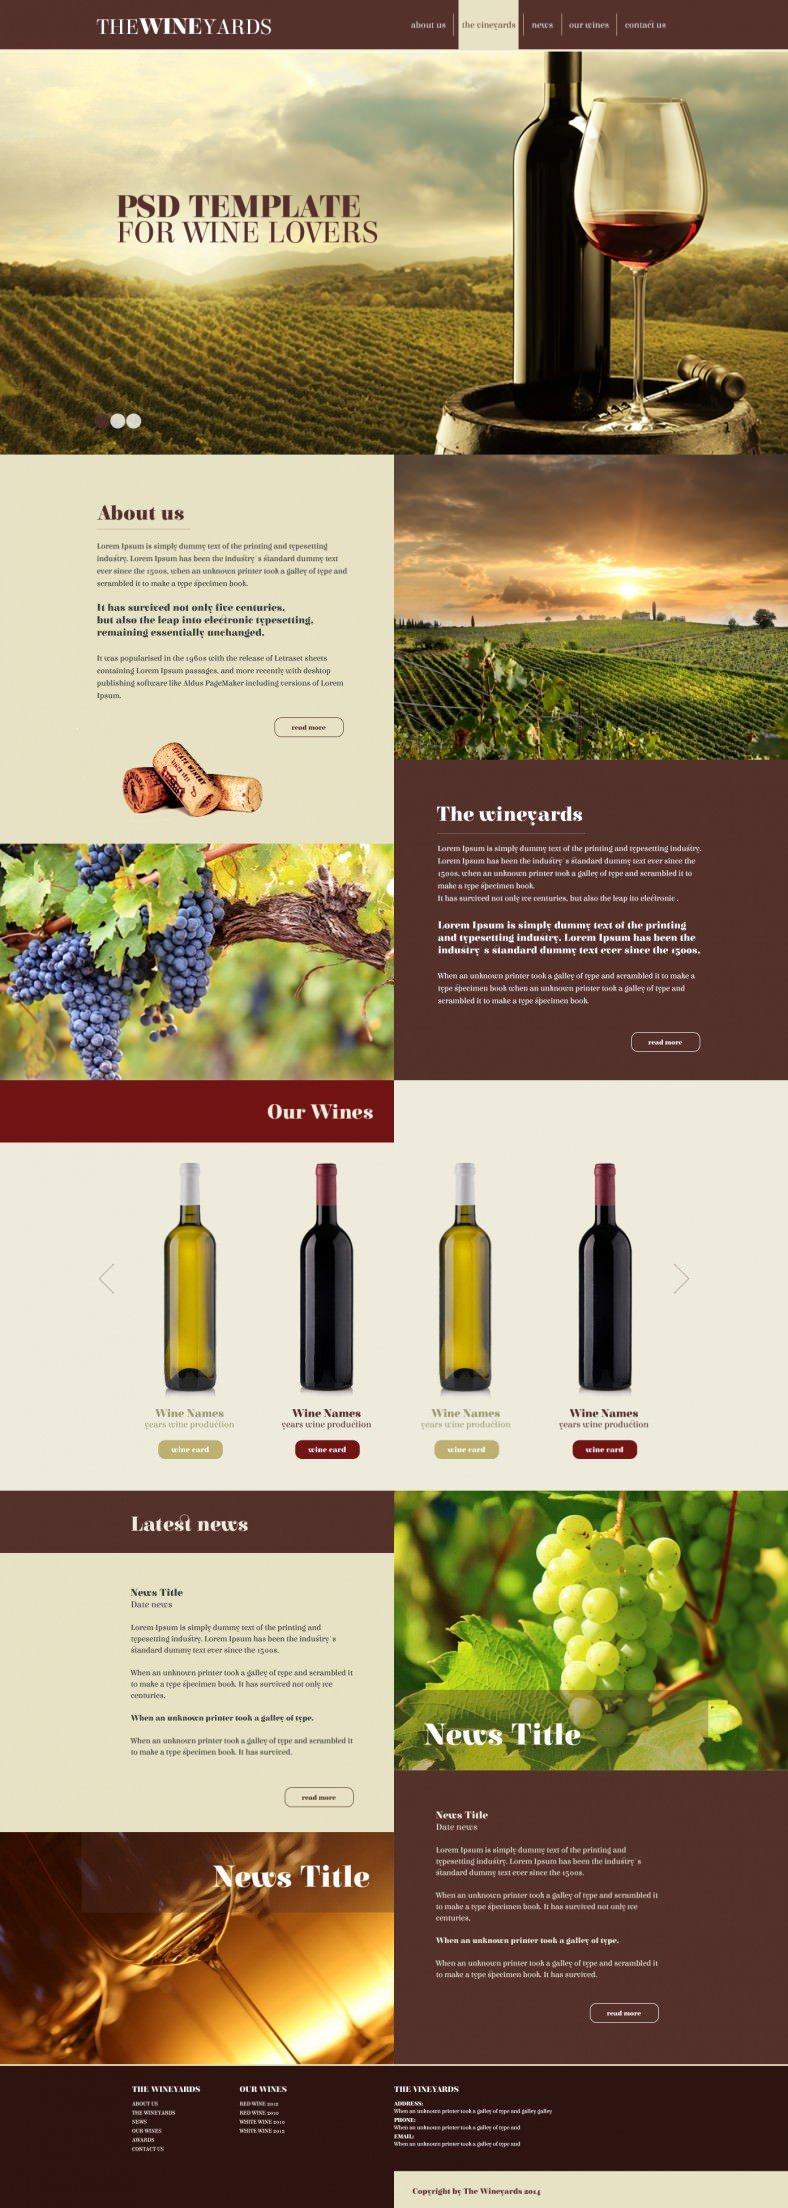 Multi Purpose Responsive PSD Template for Wine